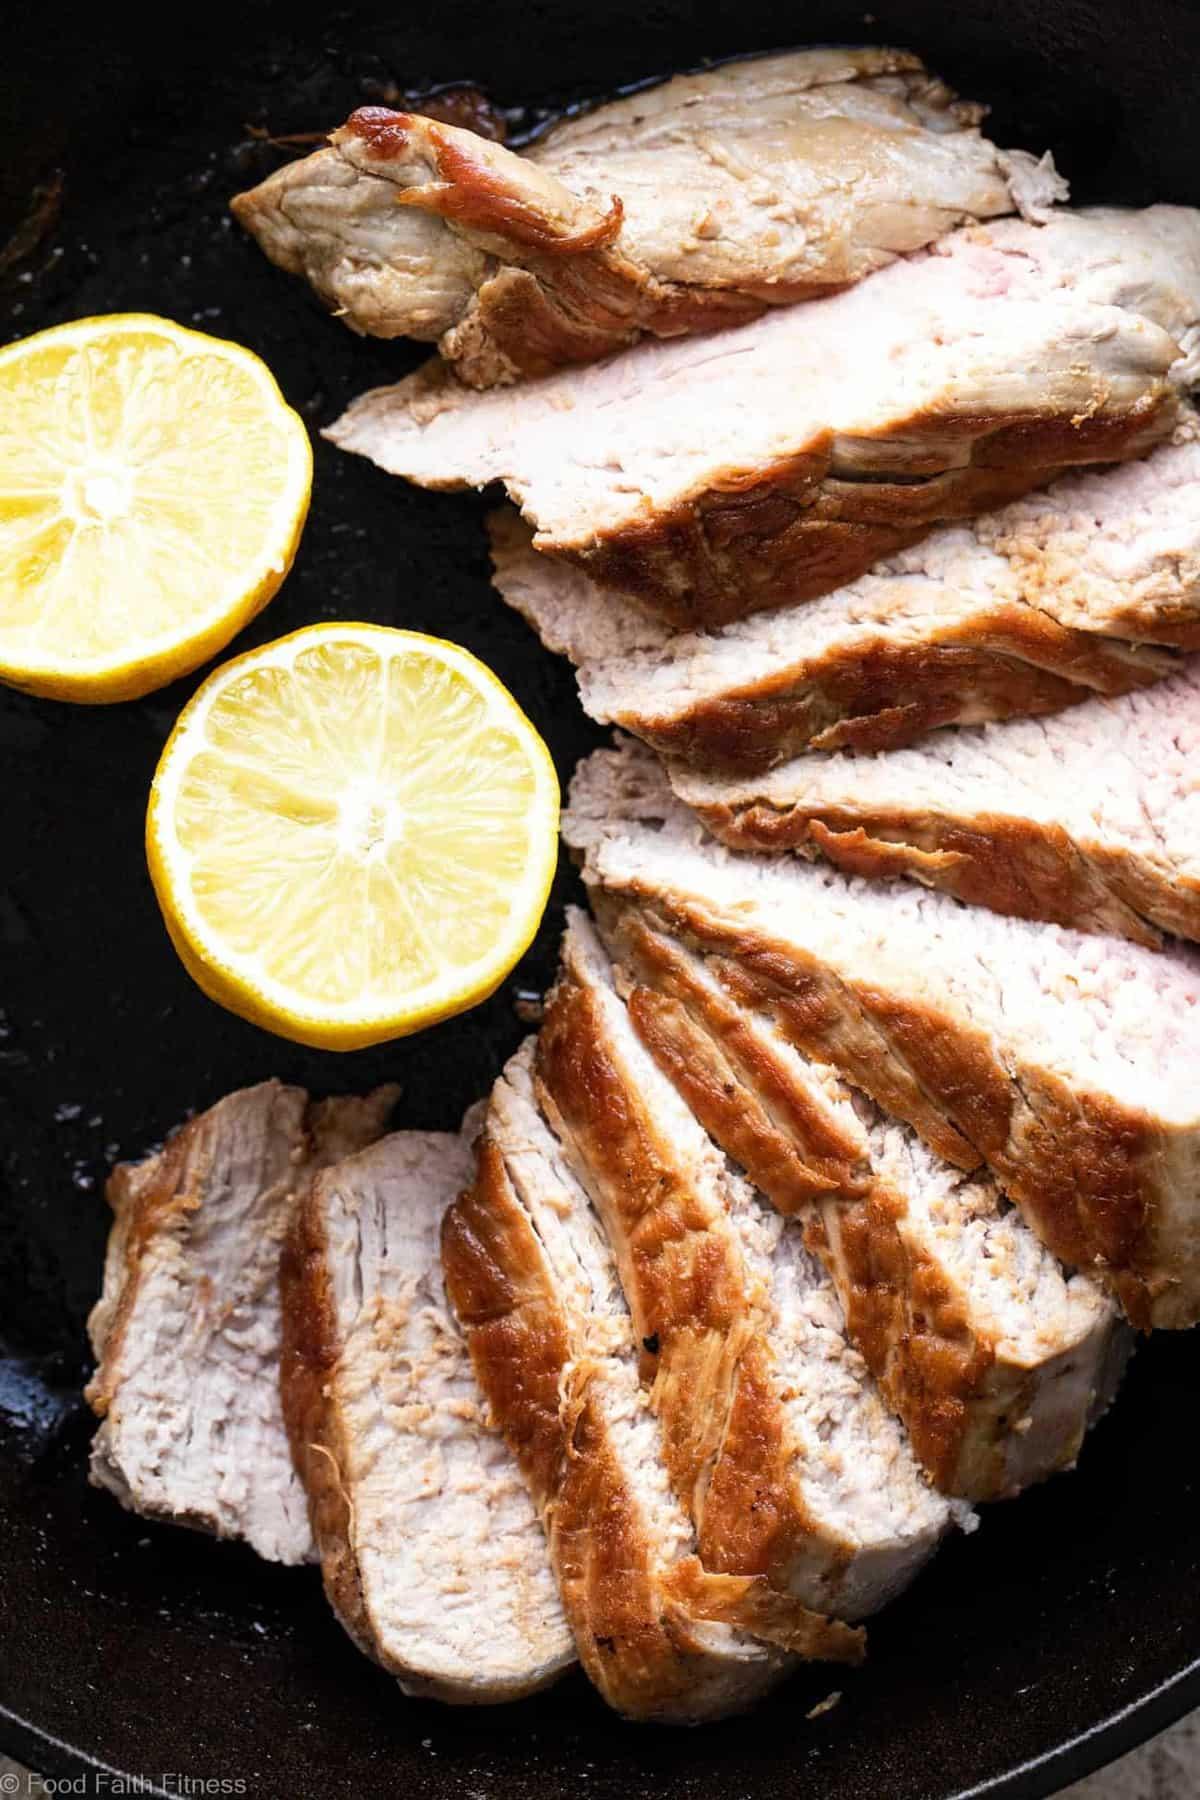 Keto Baked Pork Tenderloin with Pistachio Pesto - This easy, healthy, paleo friendly baked Pork Tenderloin has a delicious, creamy pistachio pesto! A low carb, sugar free weeknight meal that everyone will enjoy! | #Foodfaithfitness |